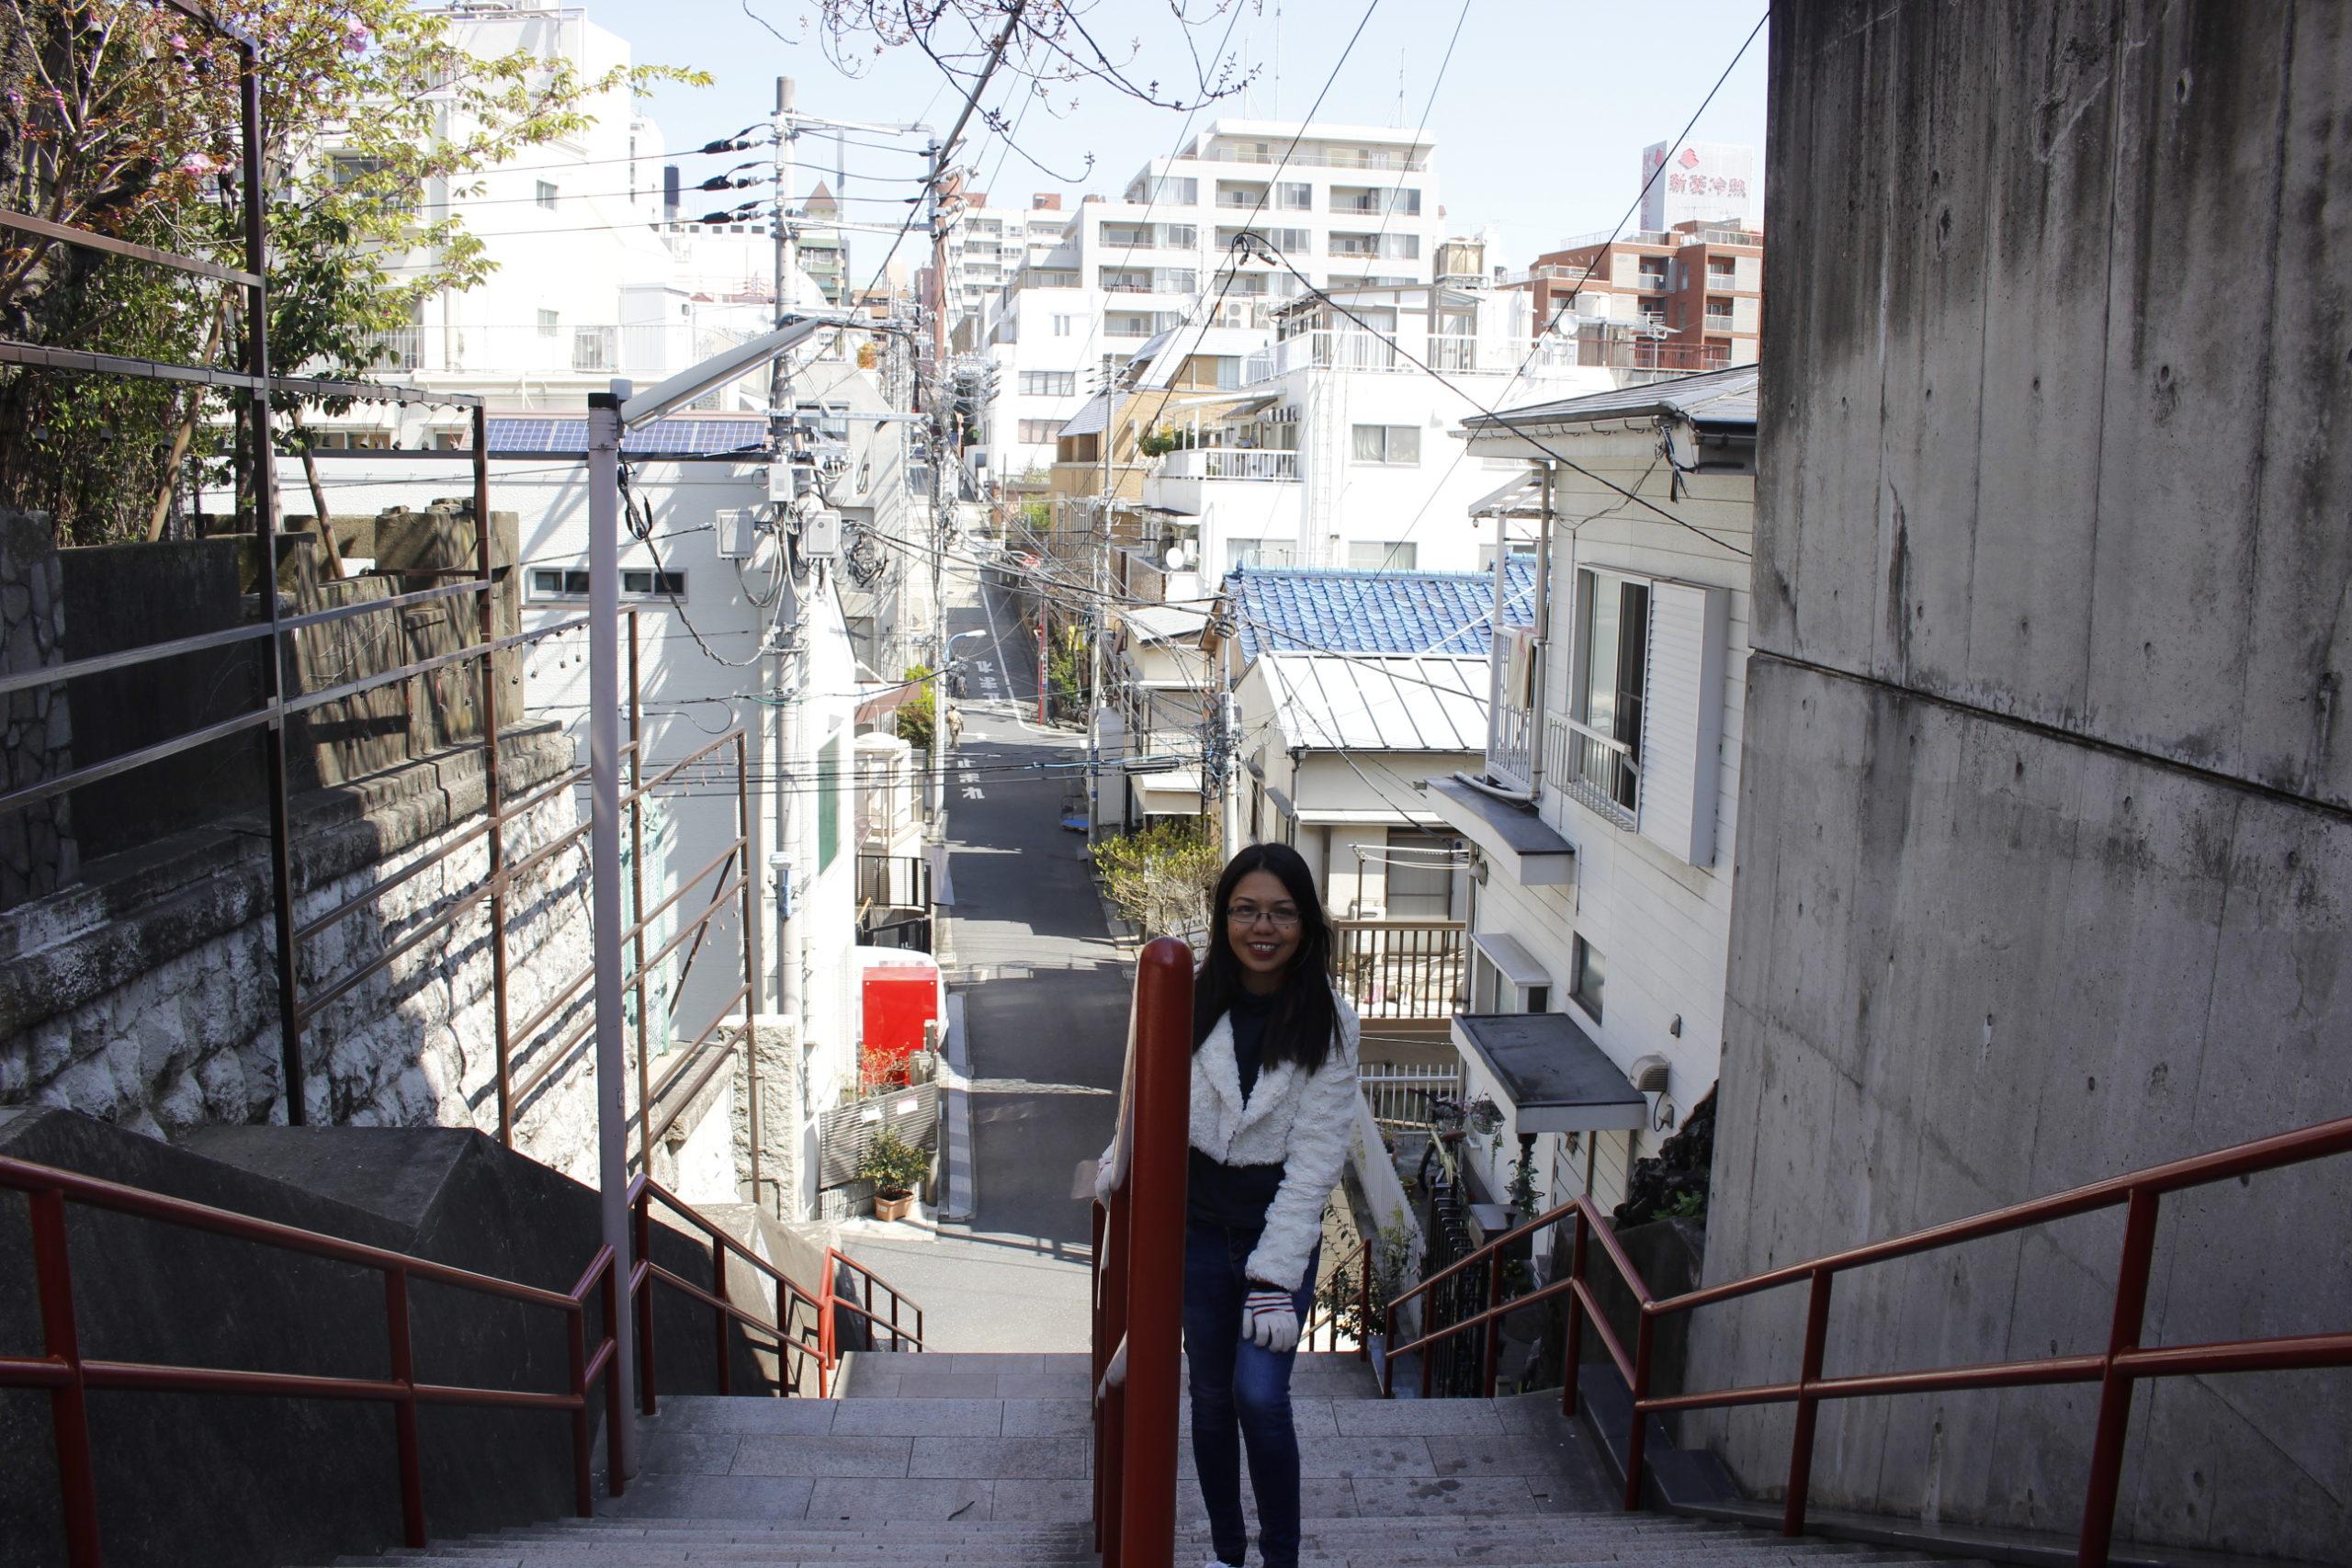 10 Things to do in Shinjuku, Tokyo, Japan (with Sample Itinerary) 1